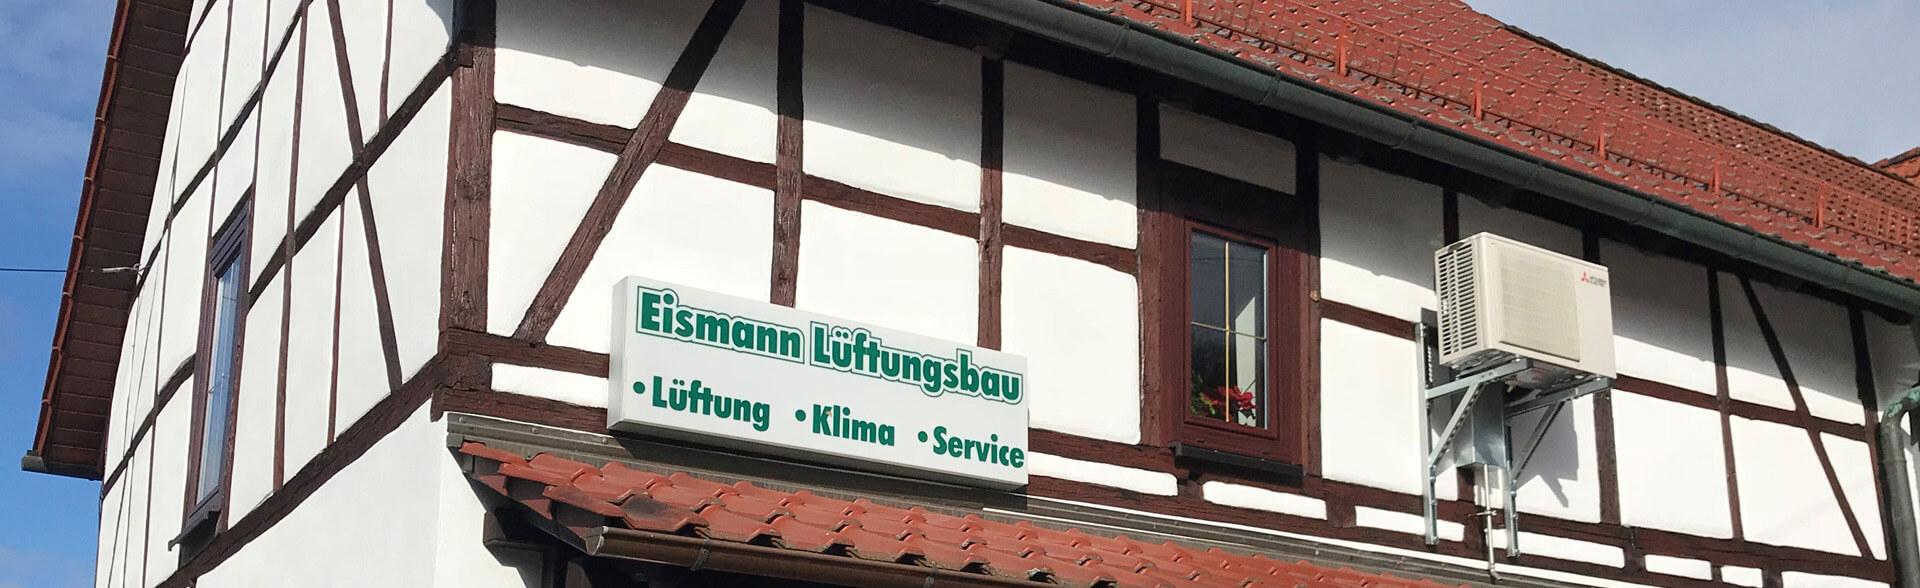 Eismann Lüftungsbau in Uhlstädt